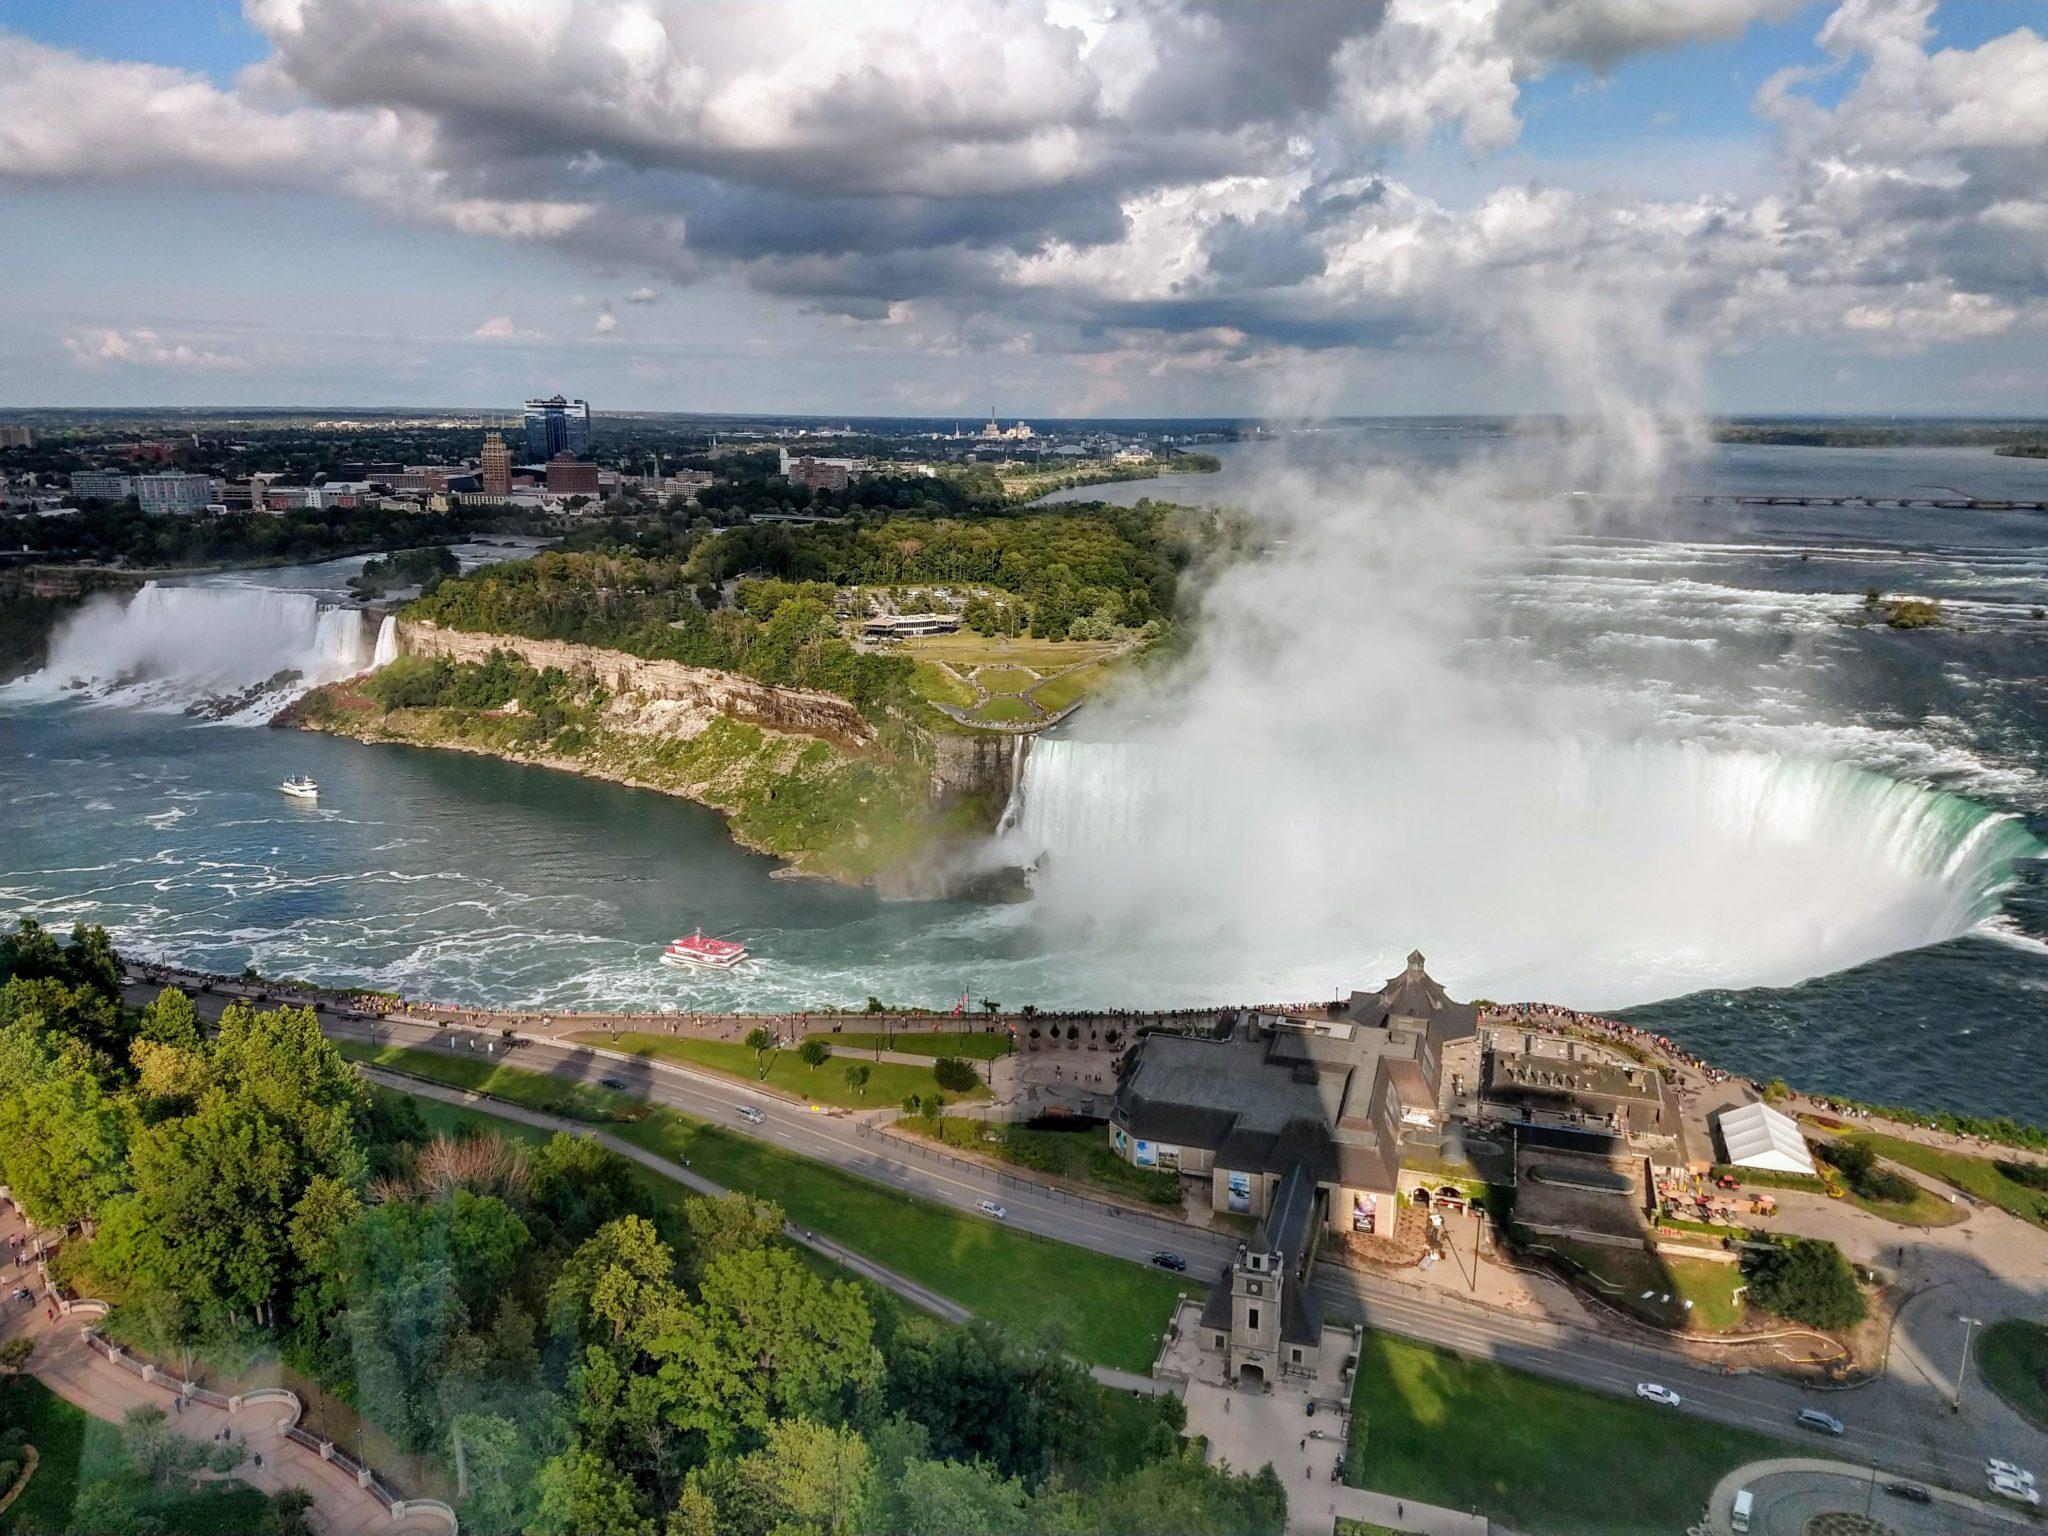 Niagara Falls View 32nd floor Fallsview Embassy Suites